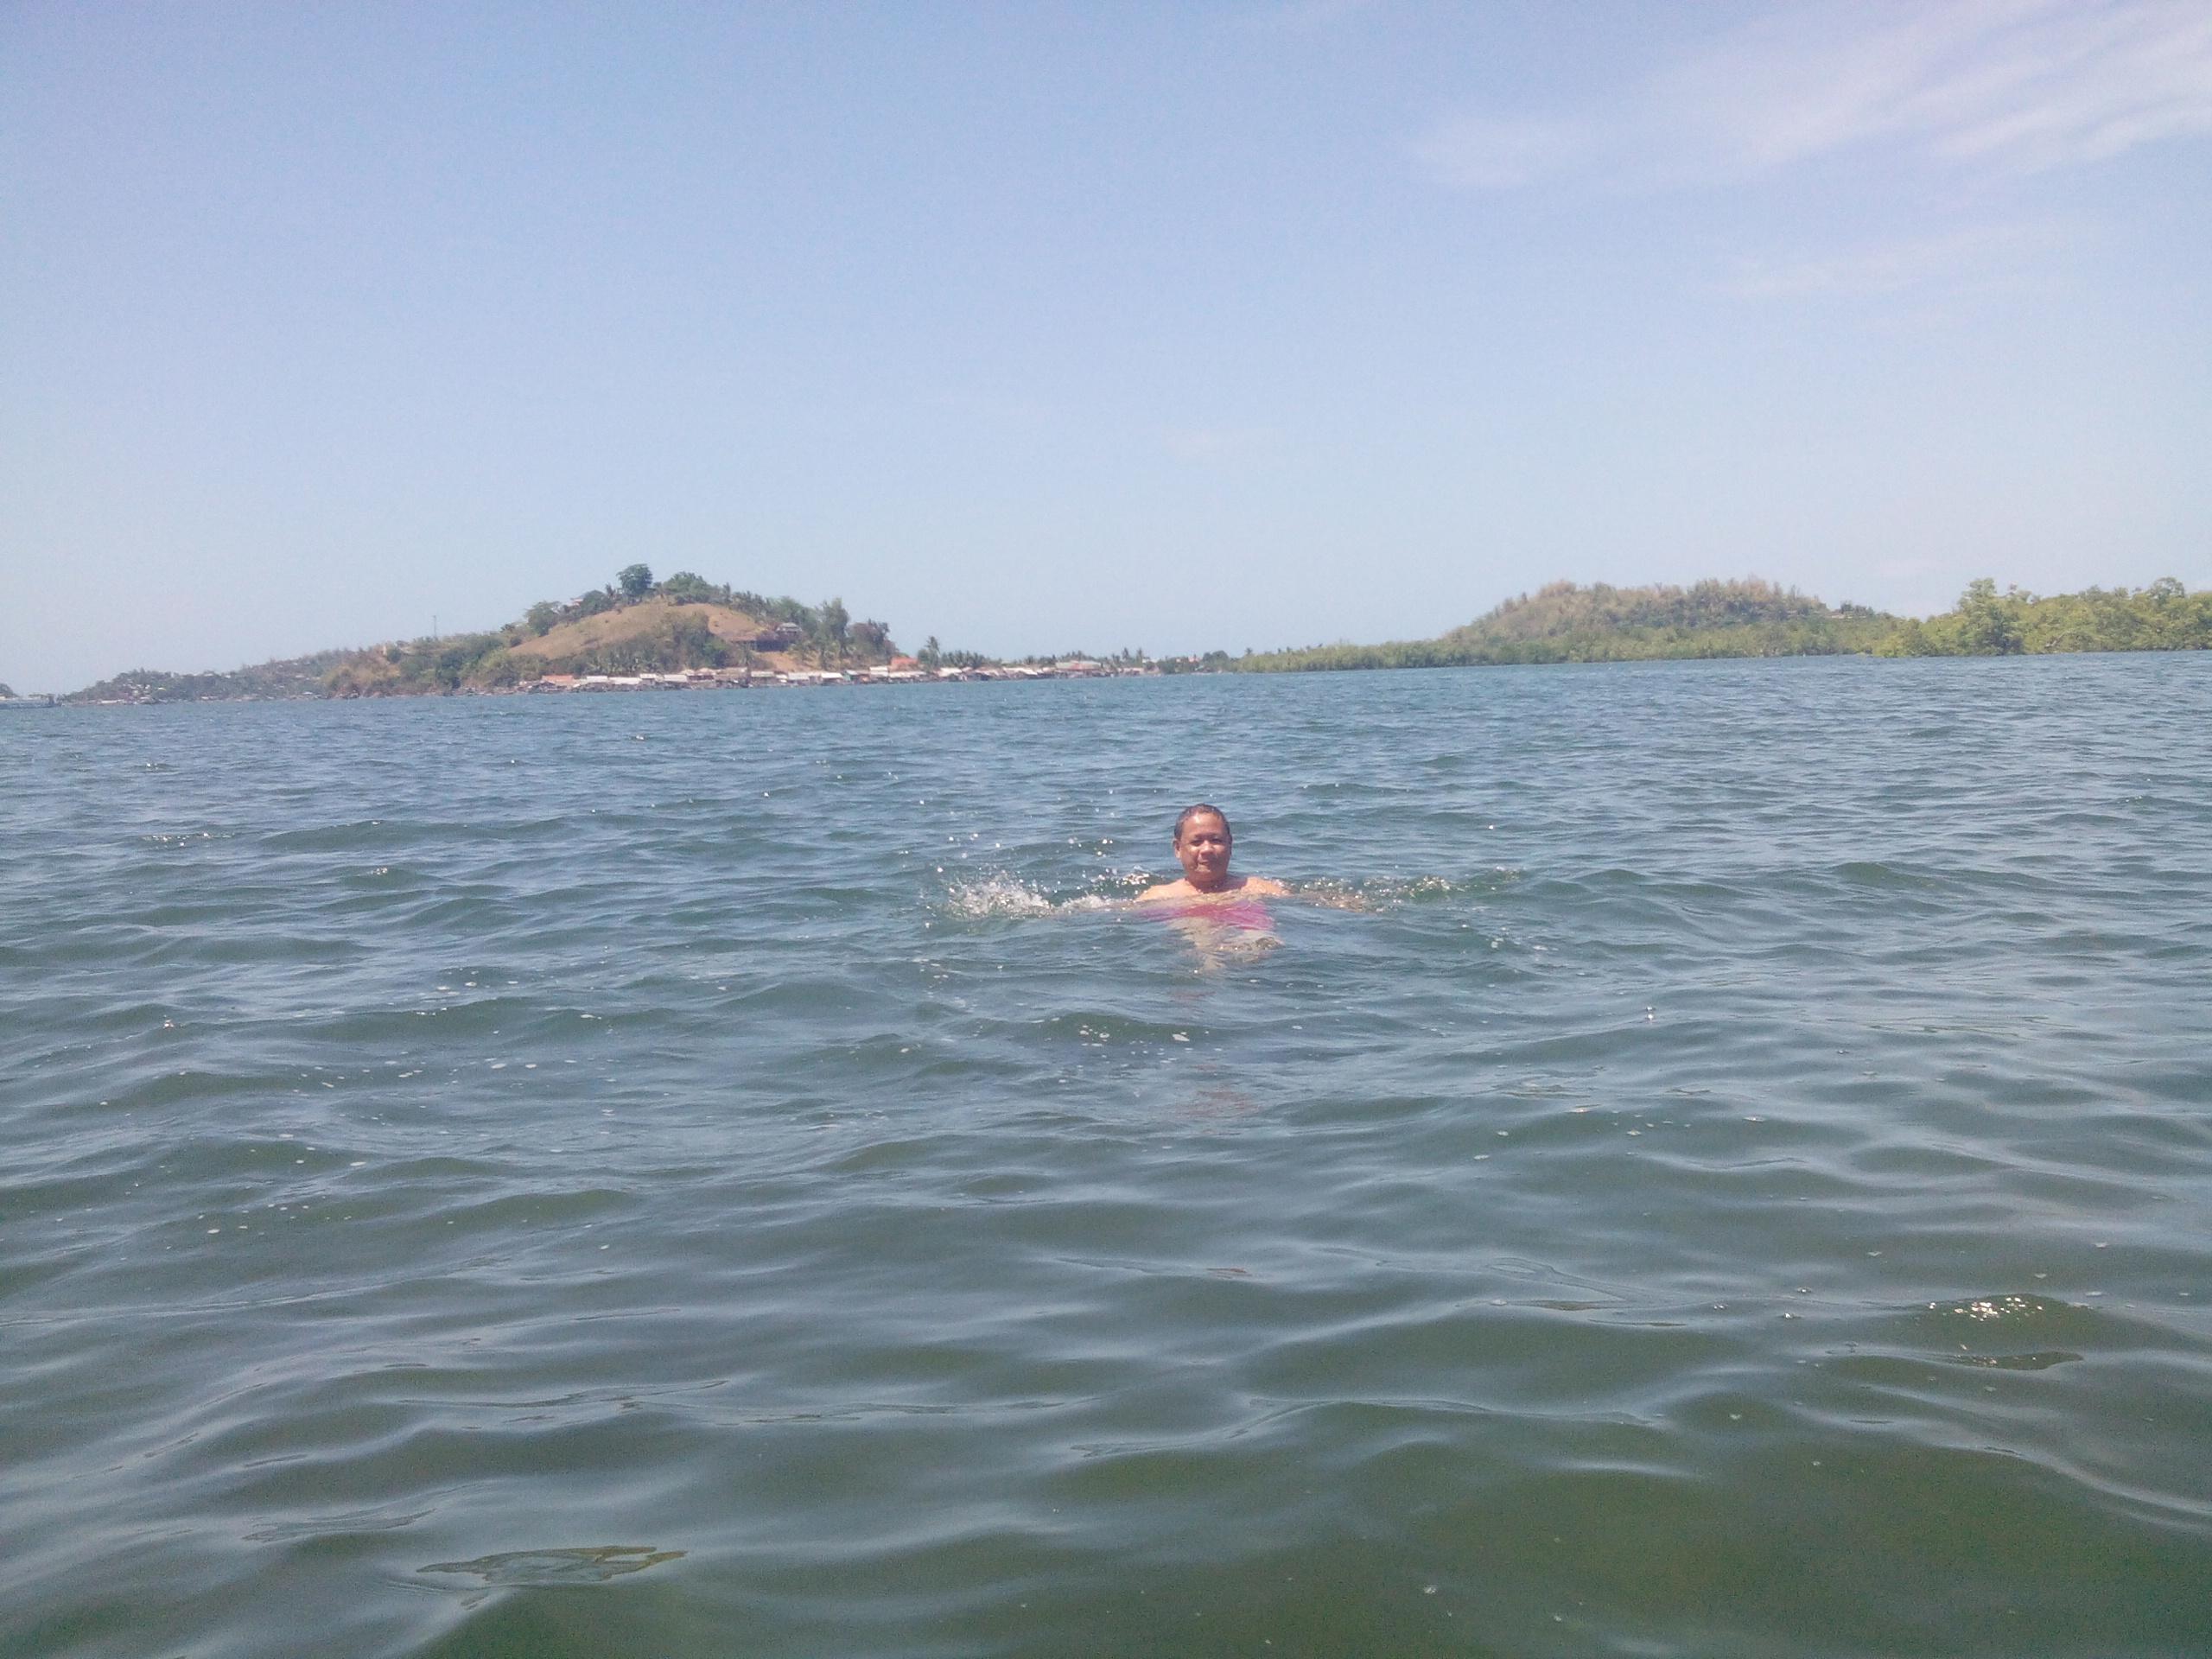 swimming to beat the summer heat